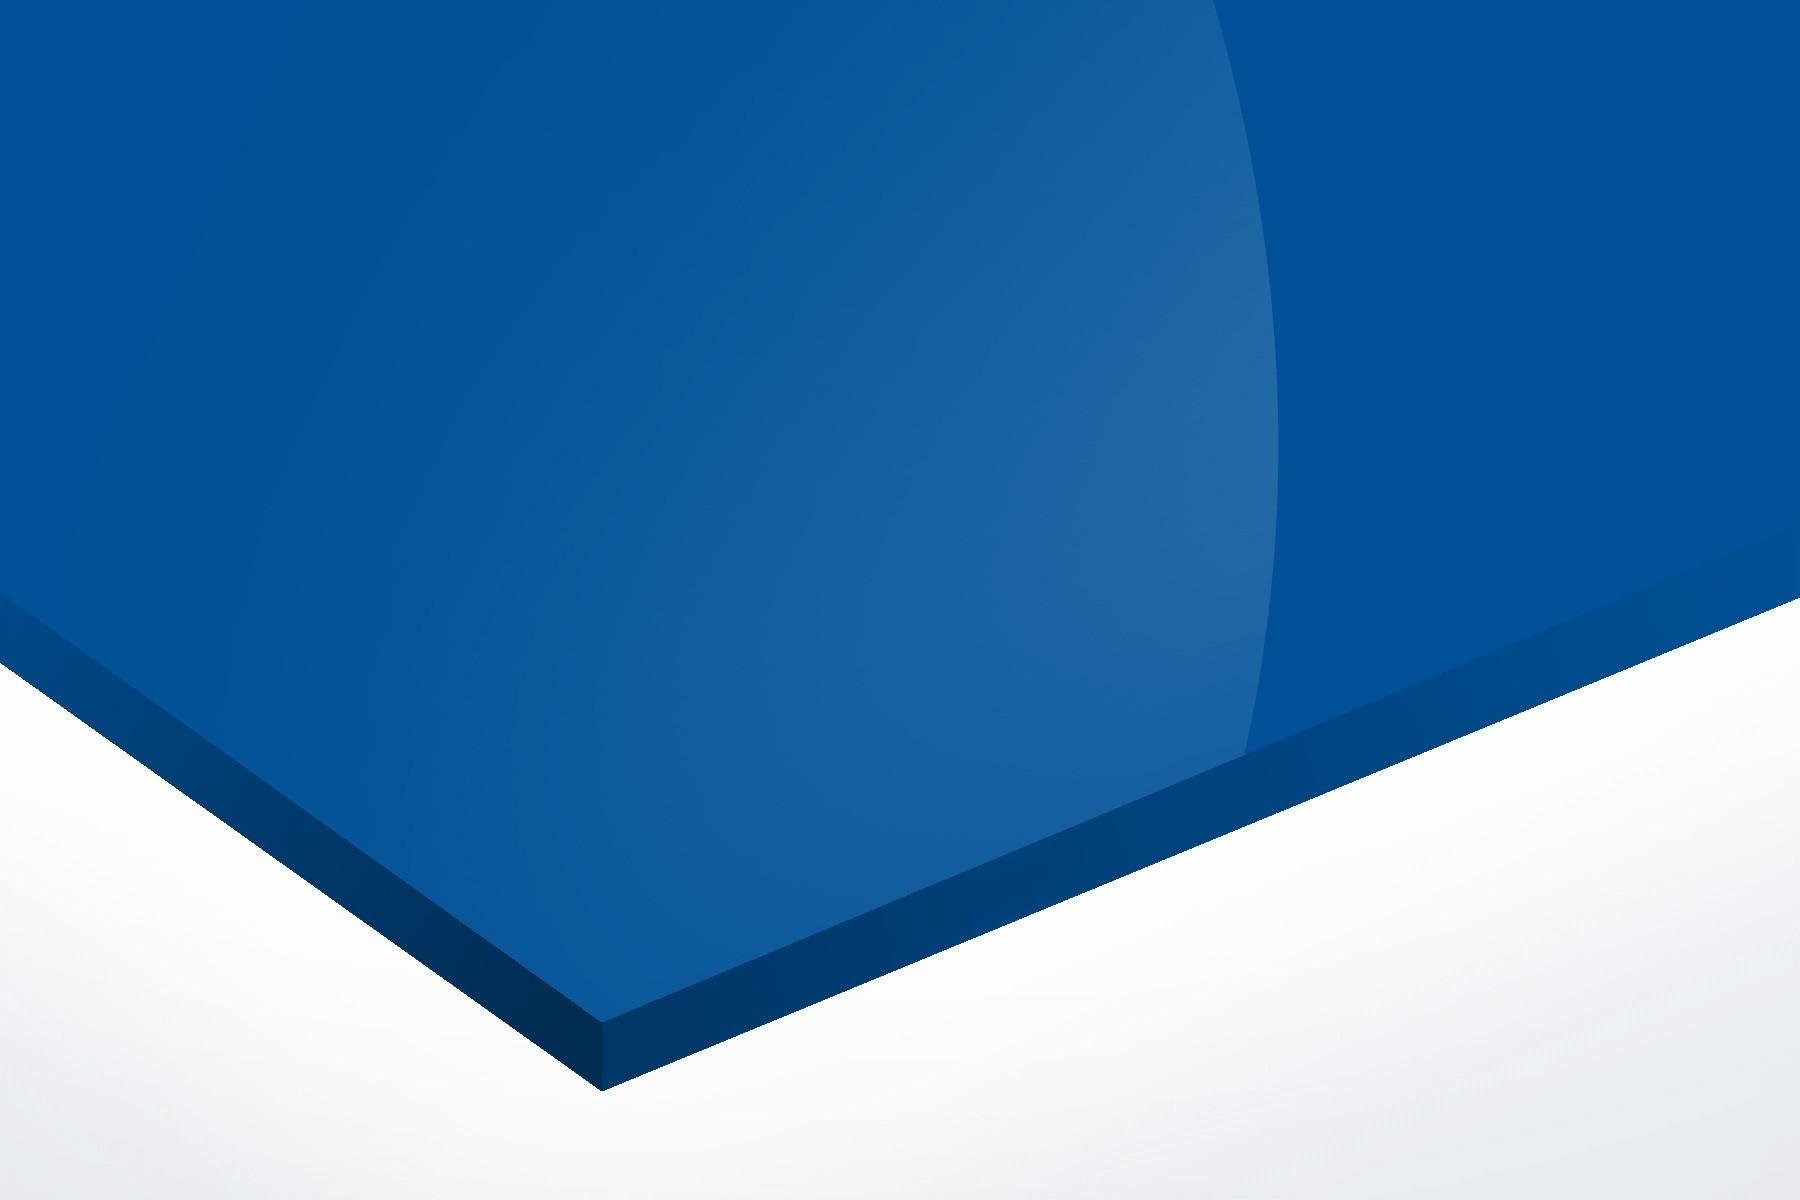 Anodised Aluminium Blue, Gloss 1mm x 1000mm x 500mm